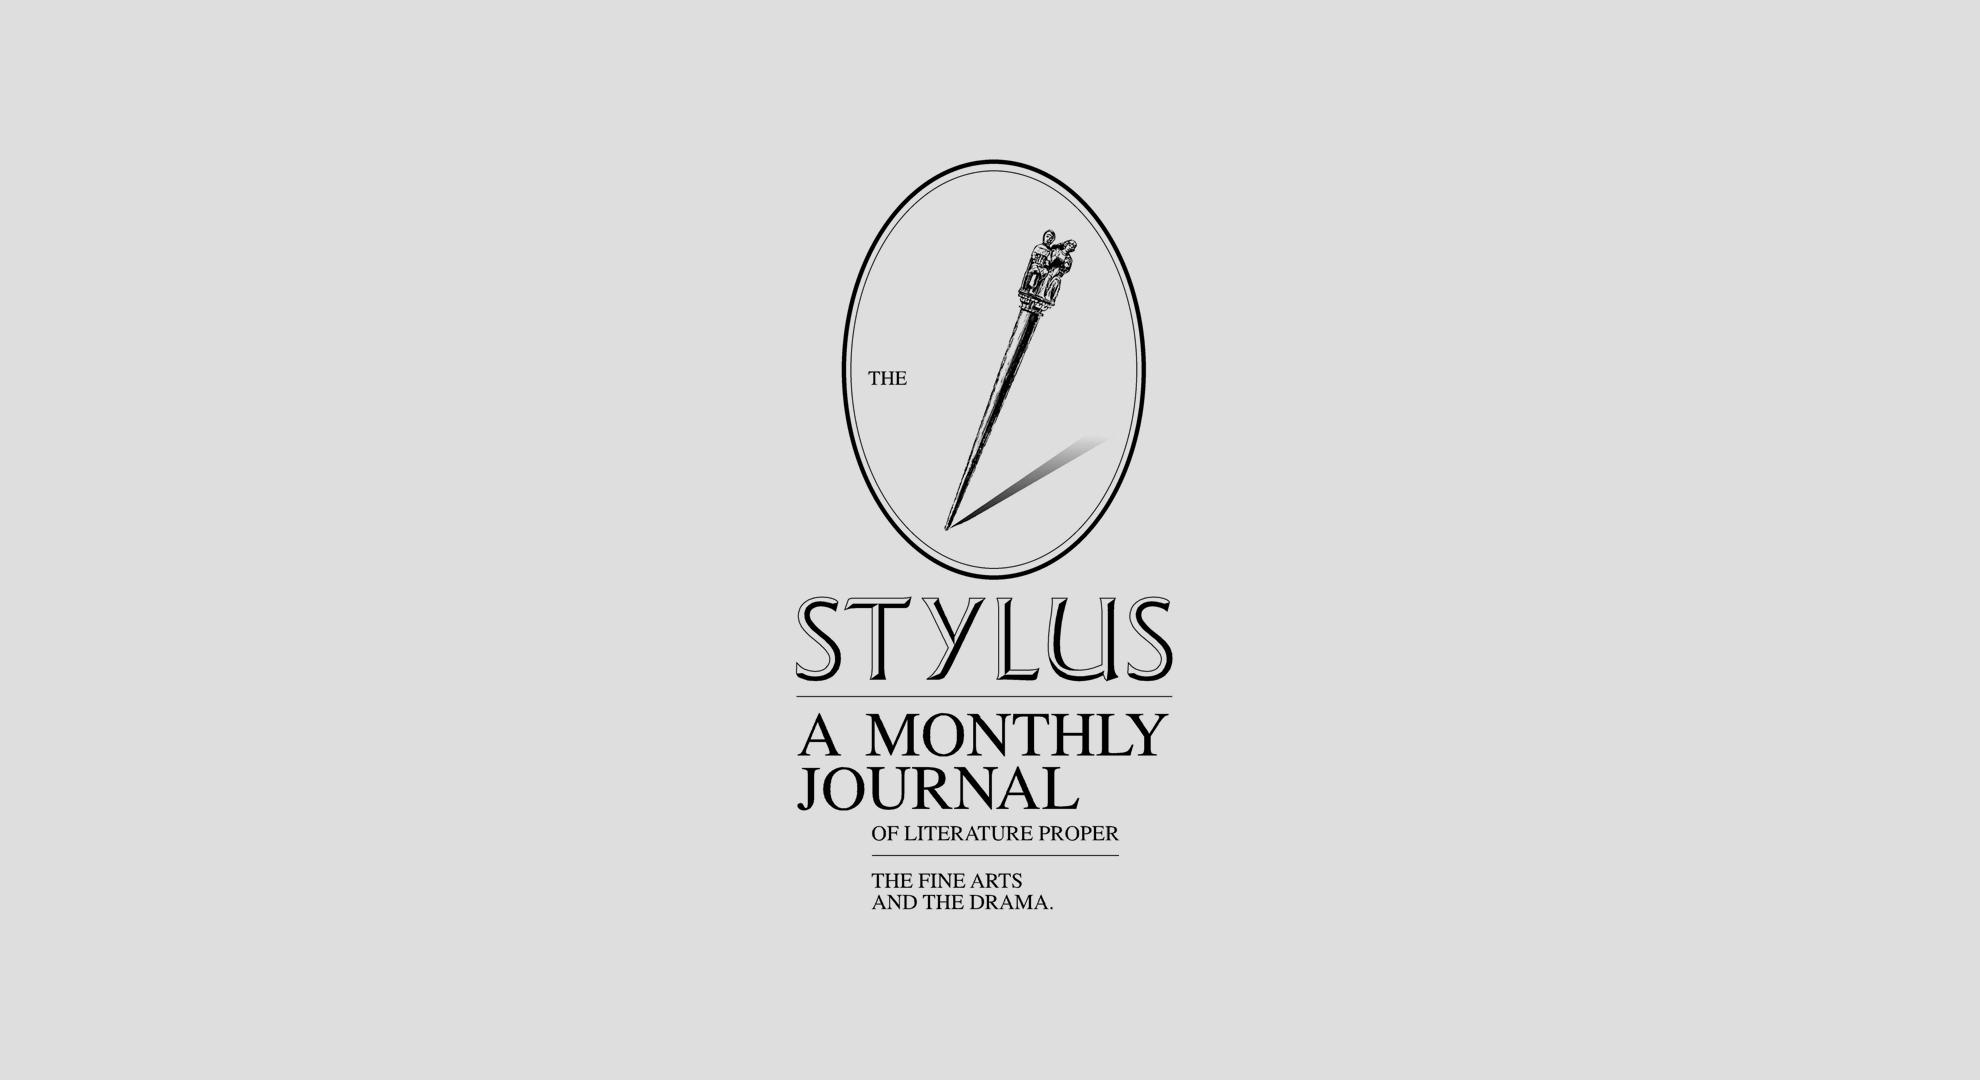 stylus1.jpg